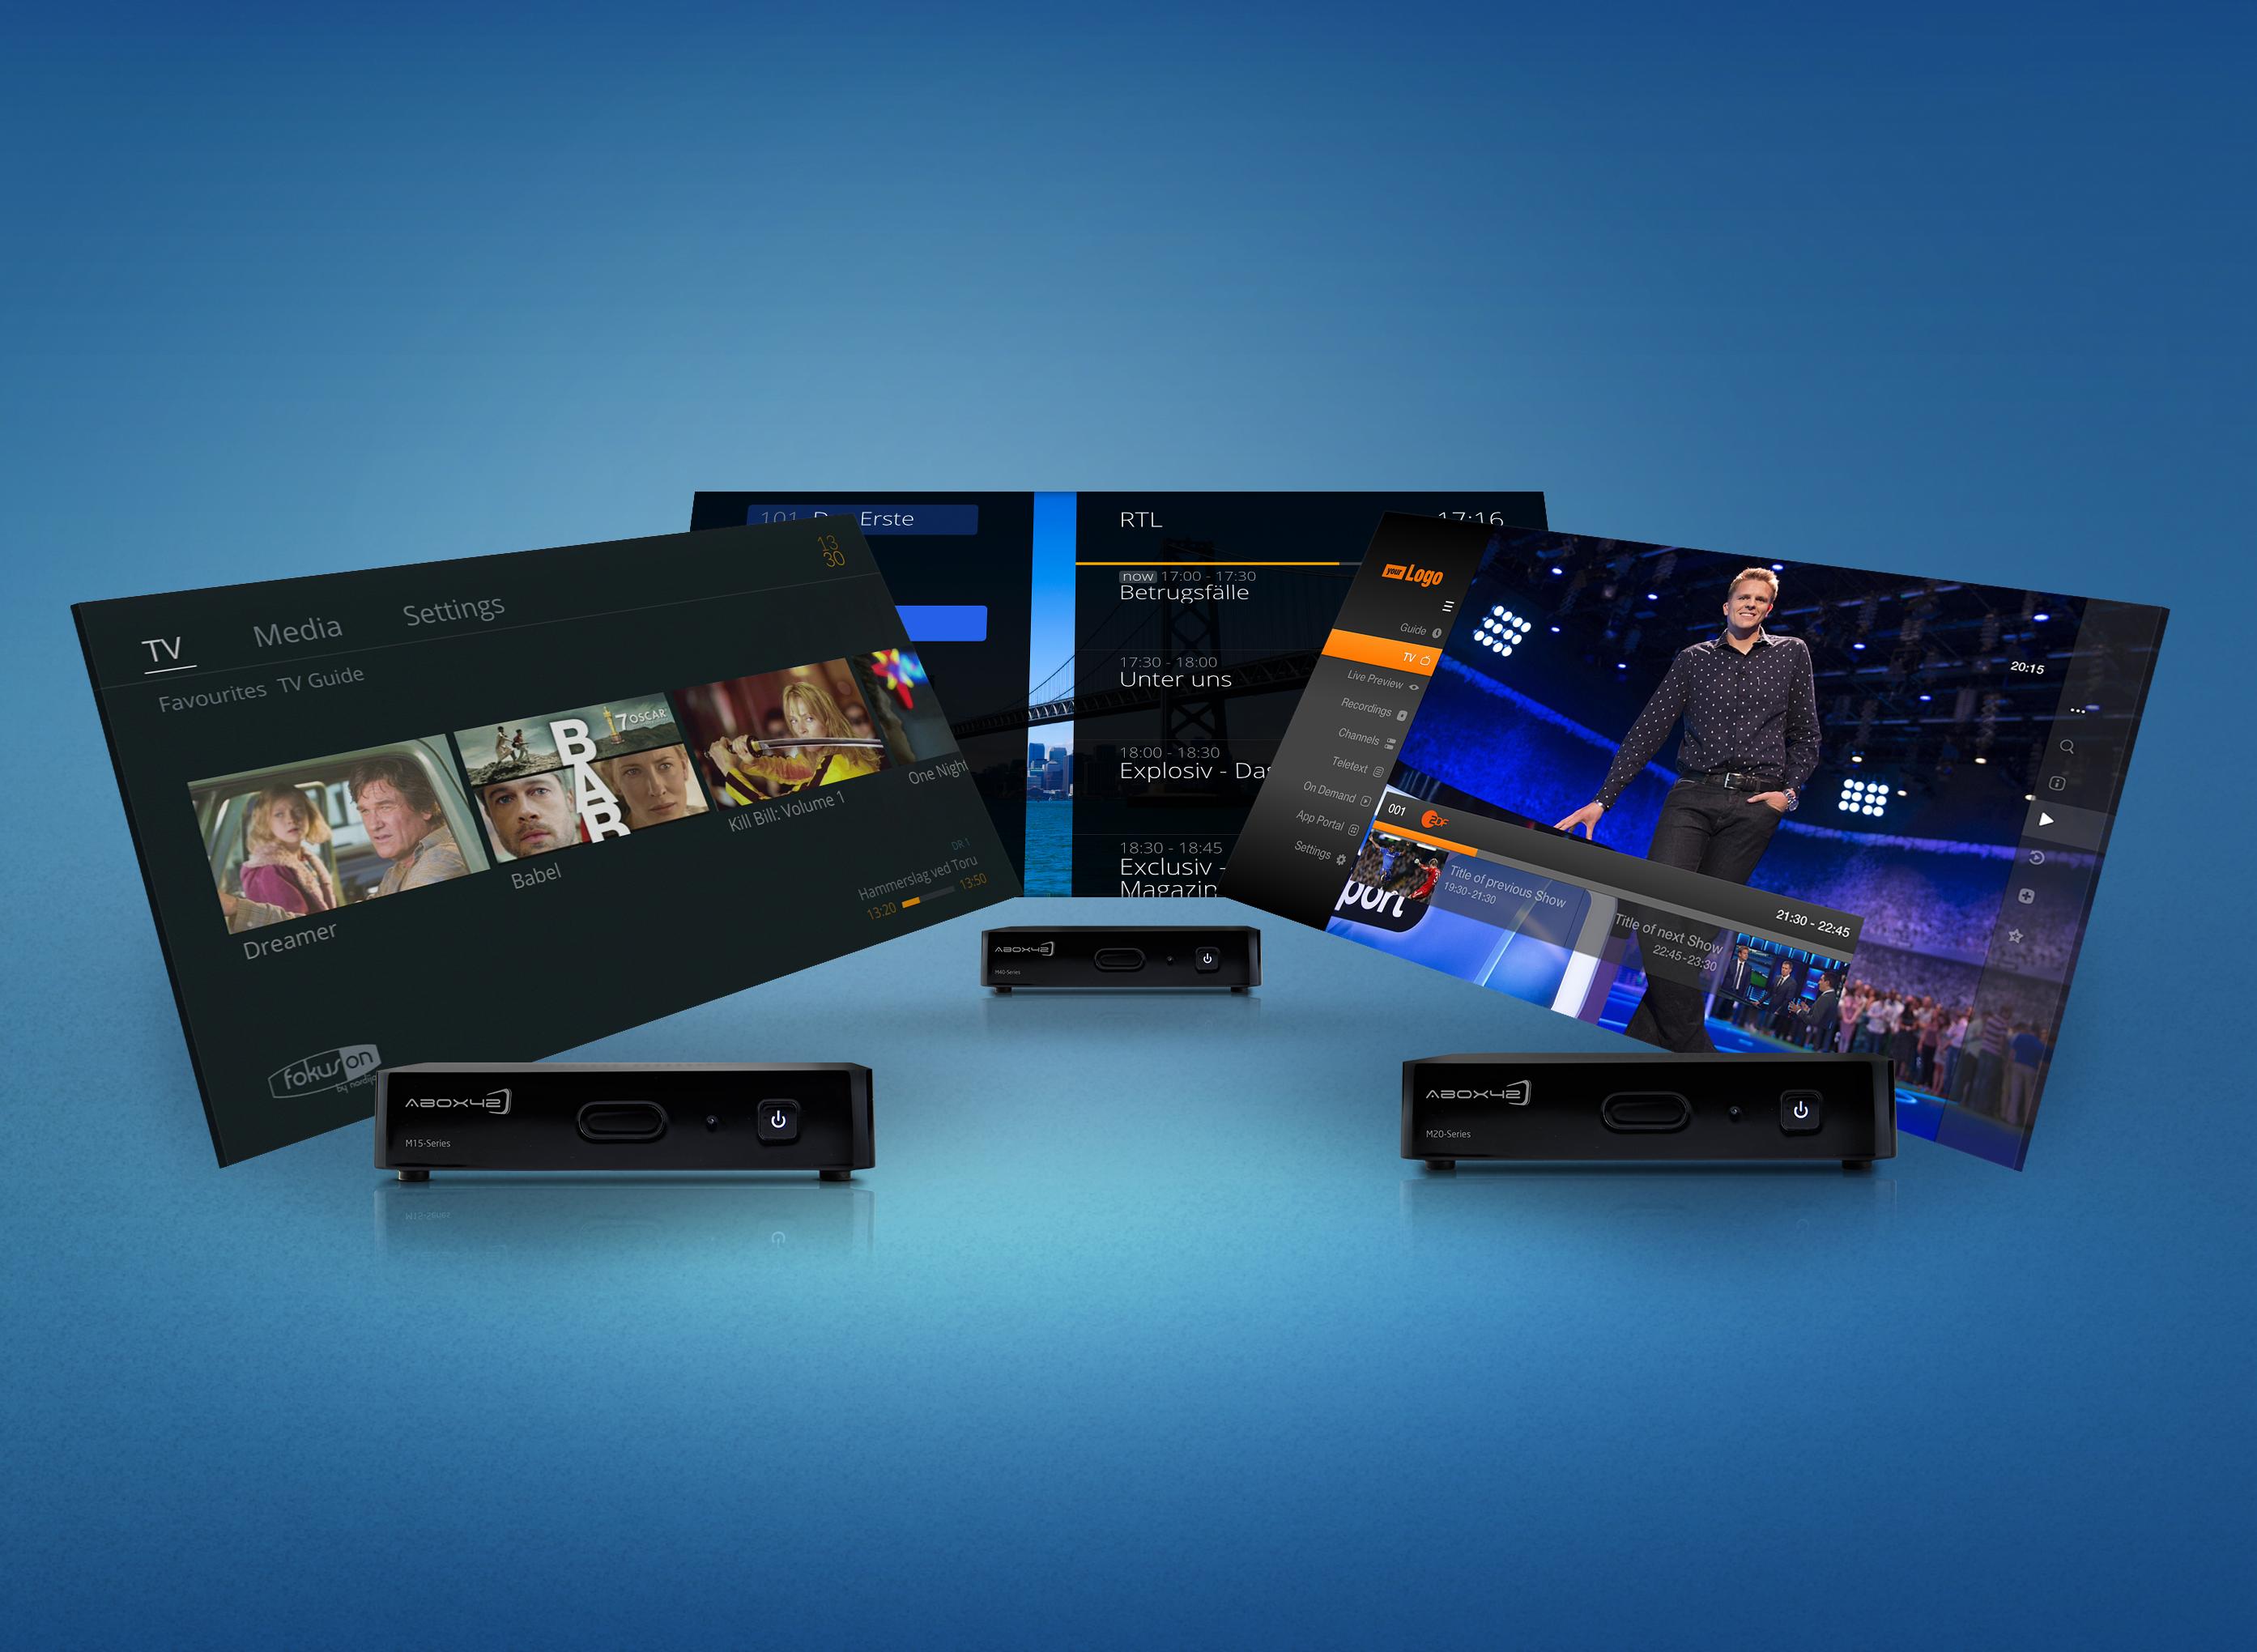 cc360e6d3b89 Abox42 to debut latest generation smart STB platform – Digital TV Europe